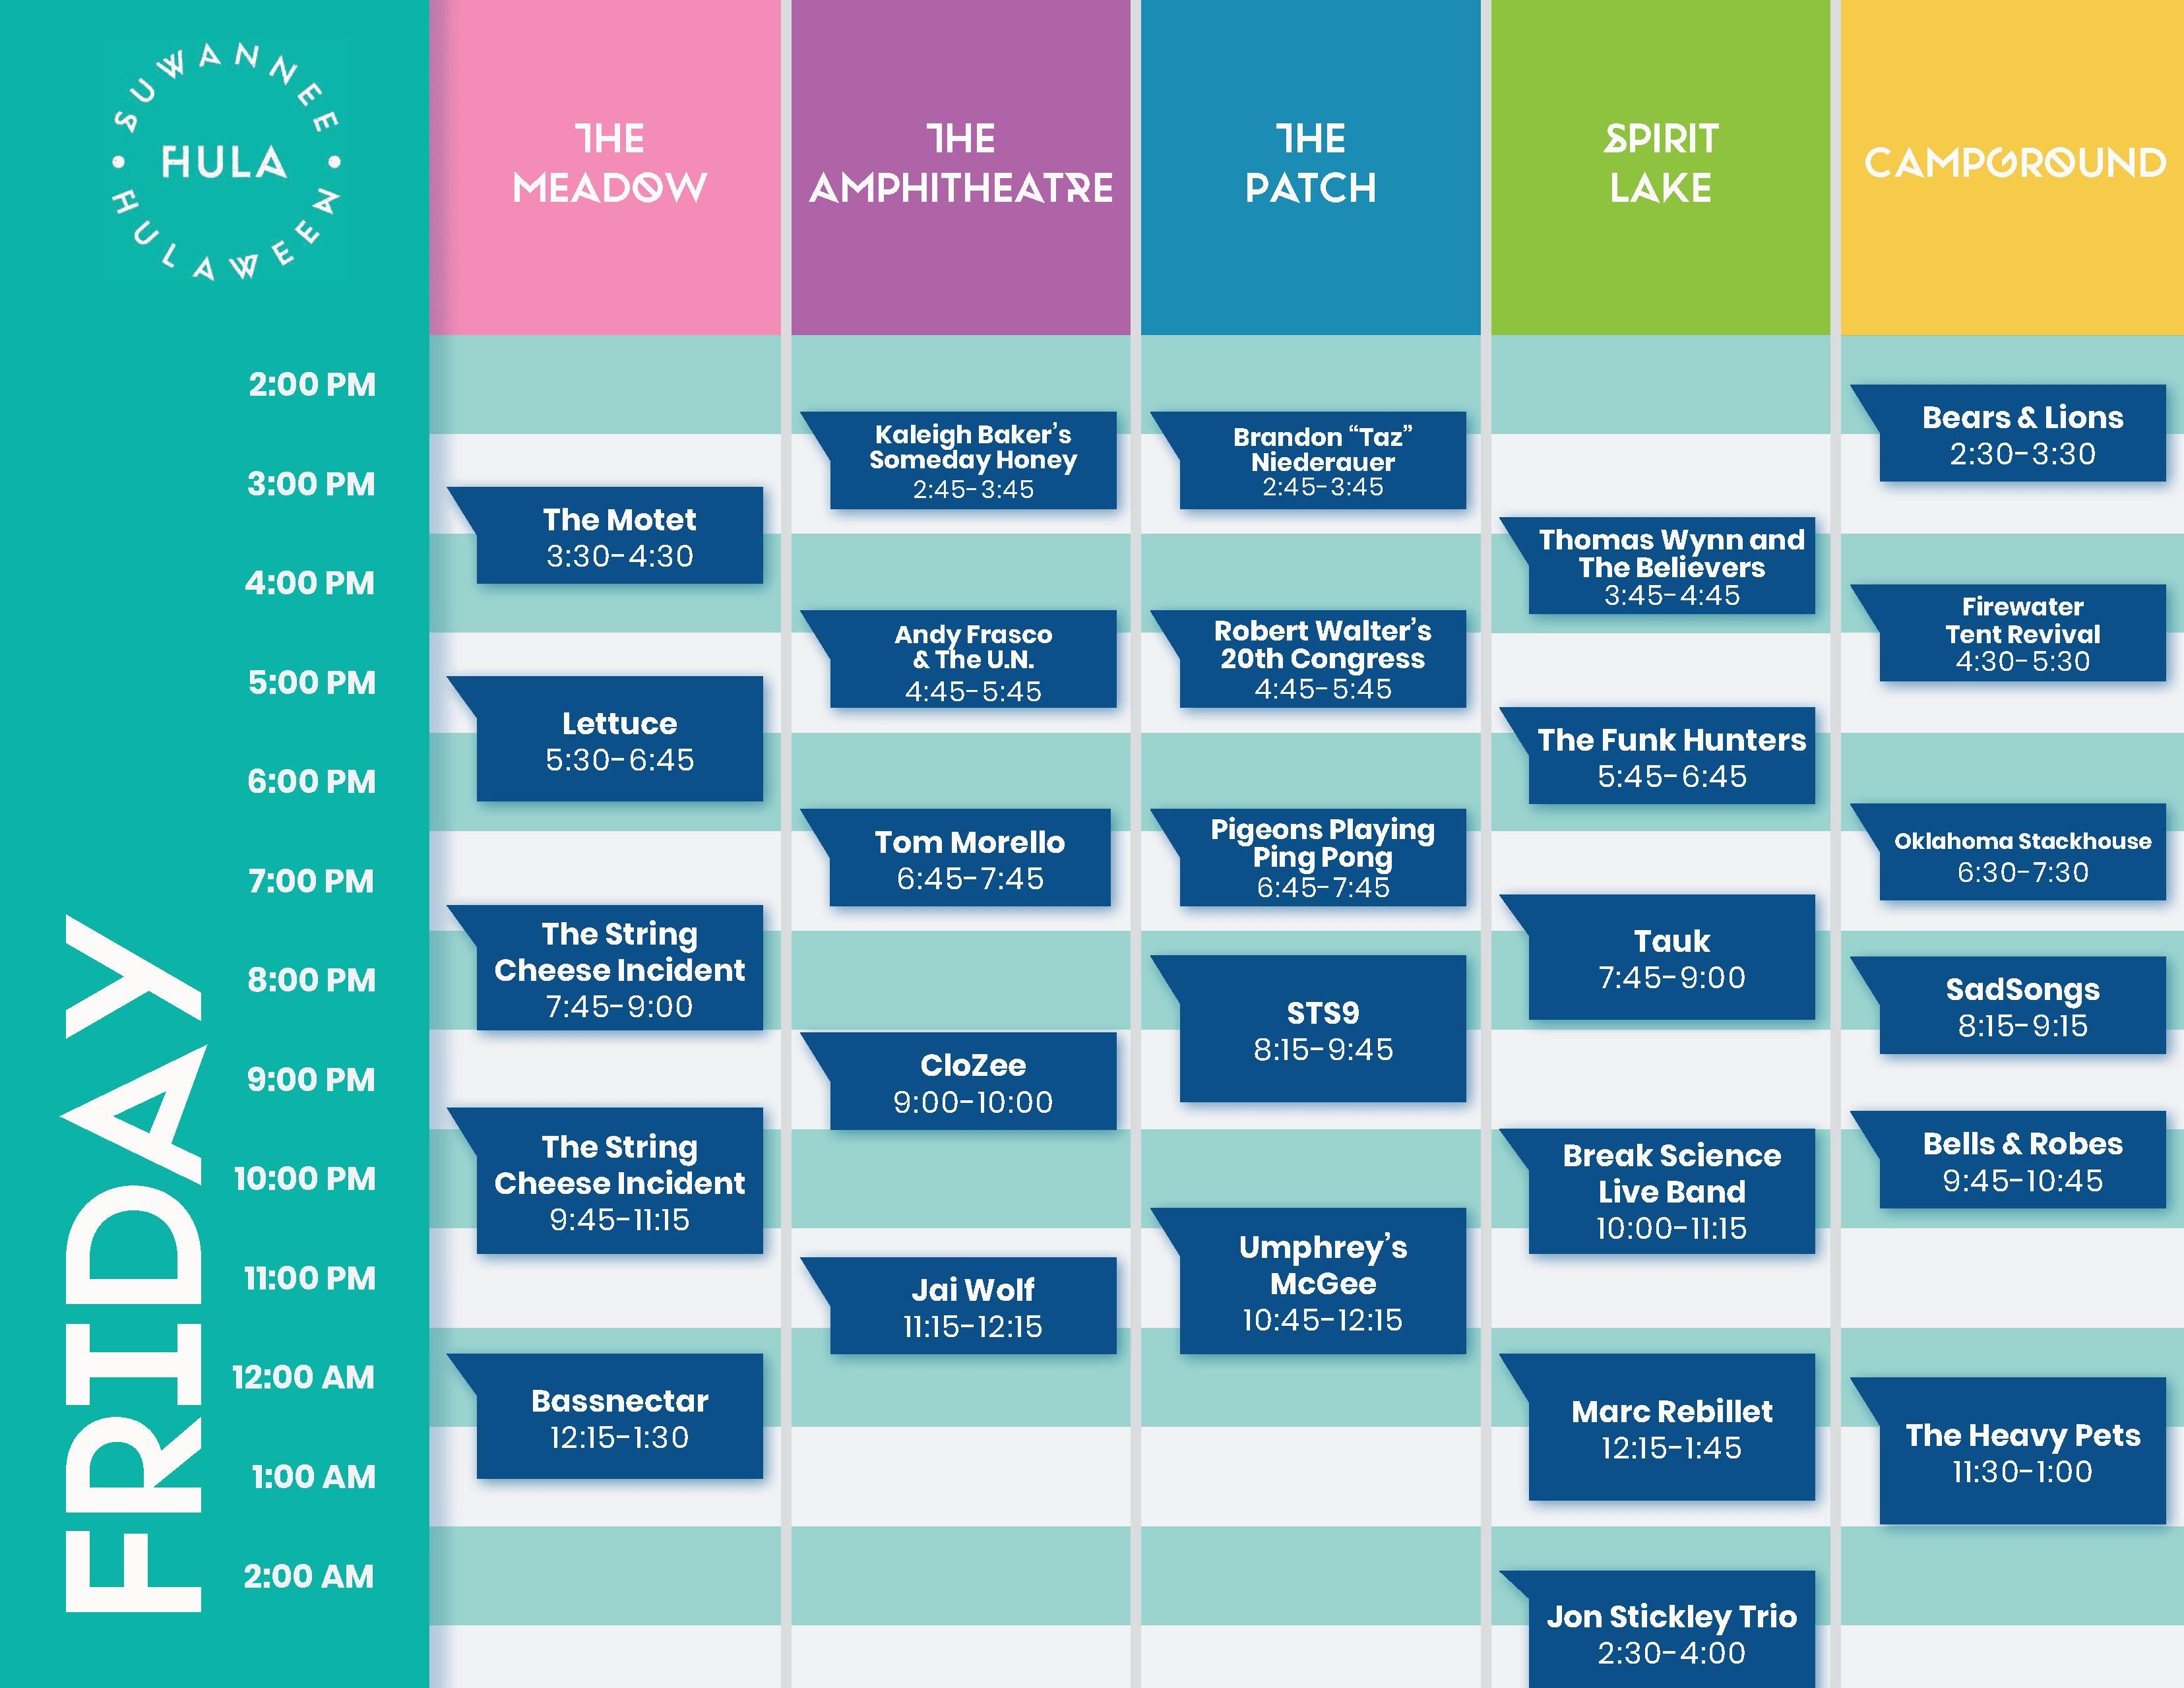 Suwannee Hulaween 2019 F Lineup